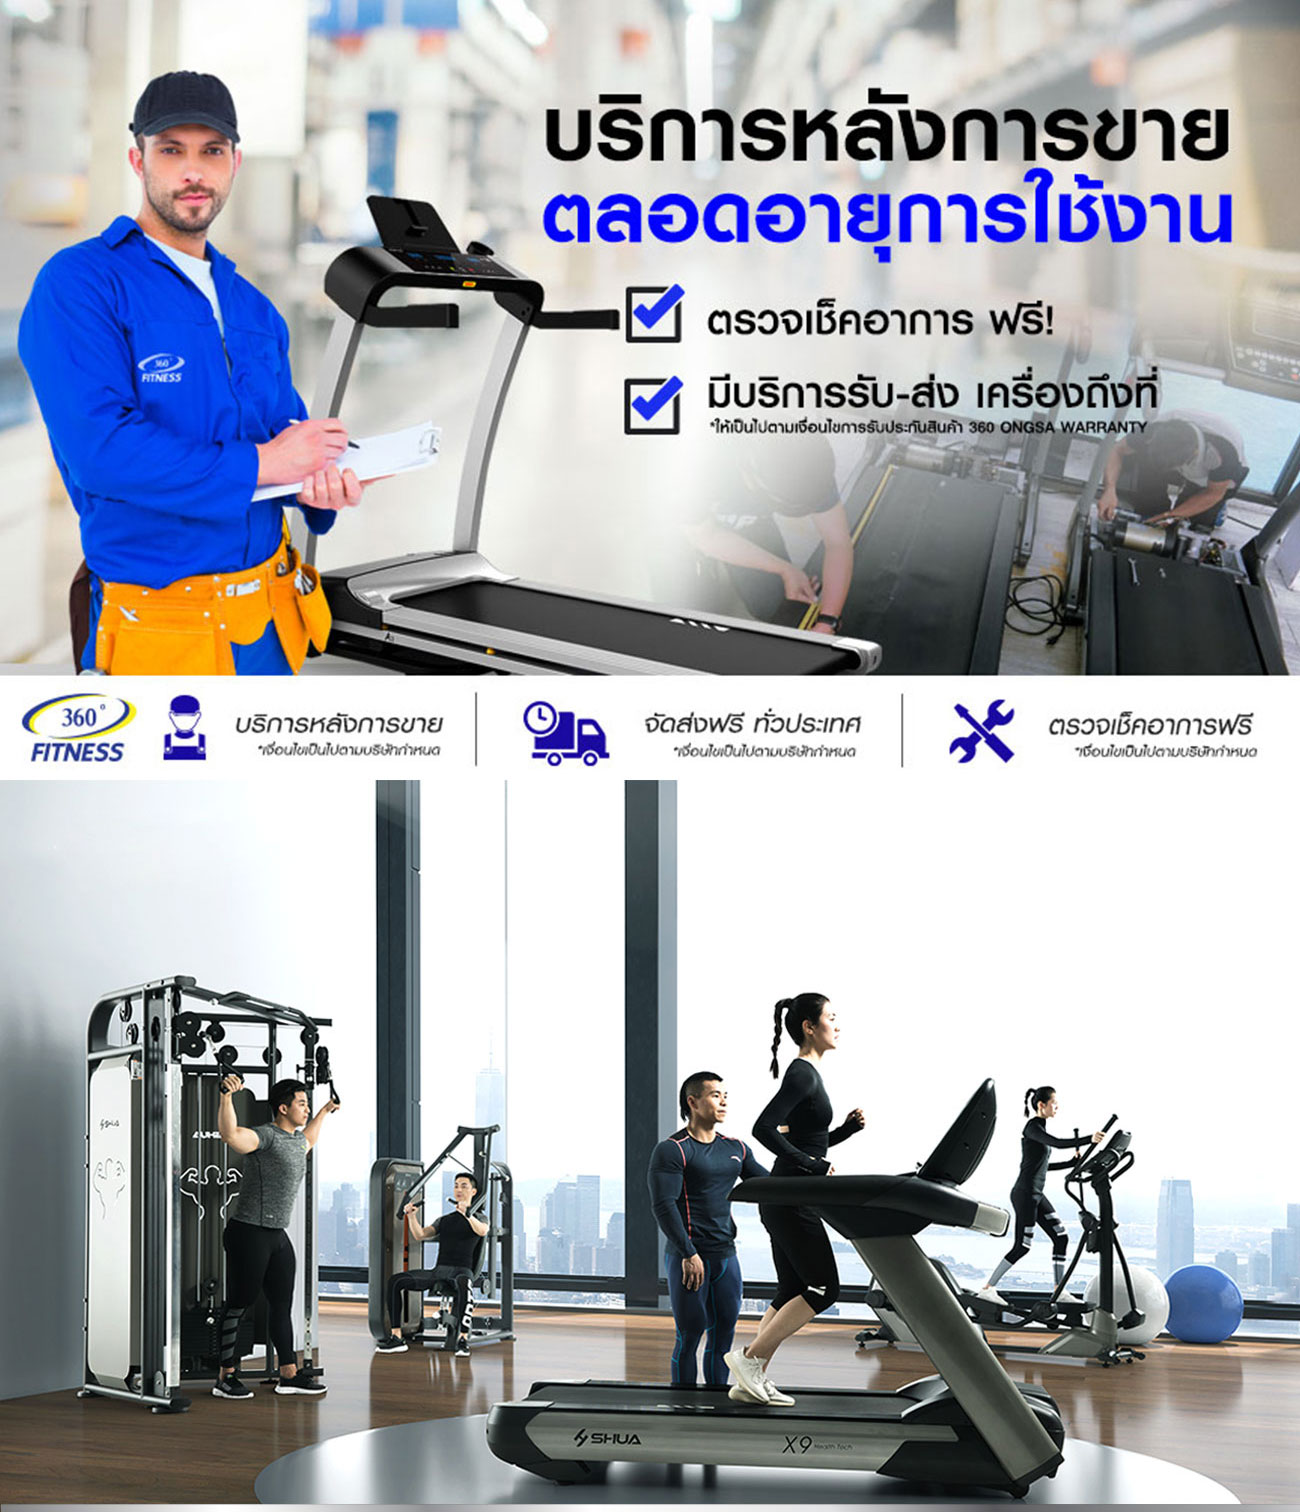 NBR yoga mat MX02